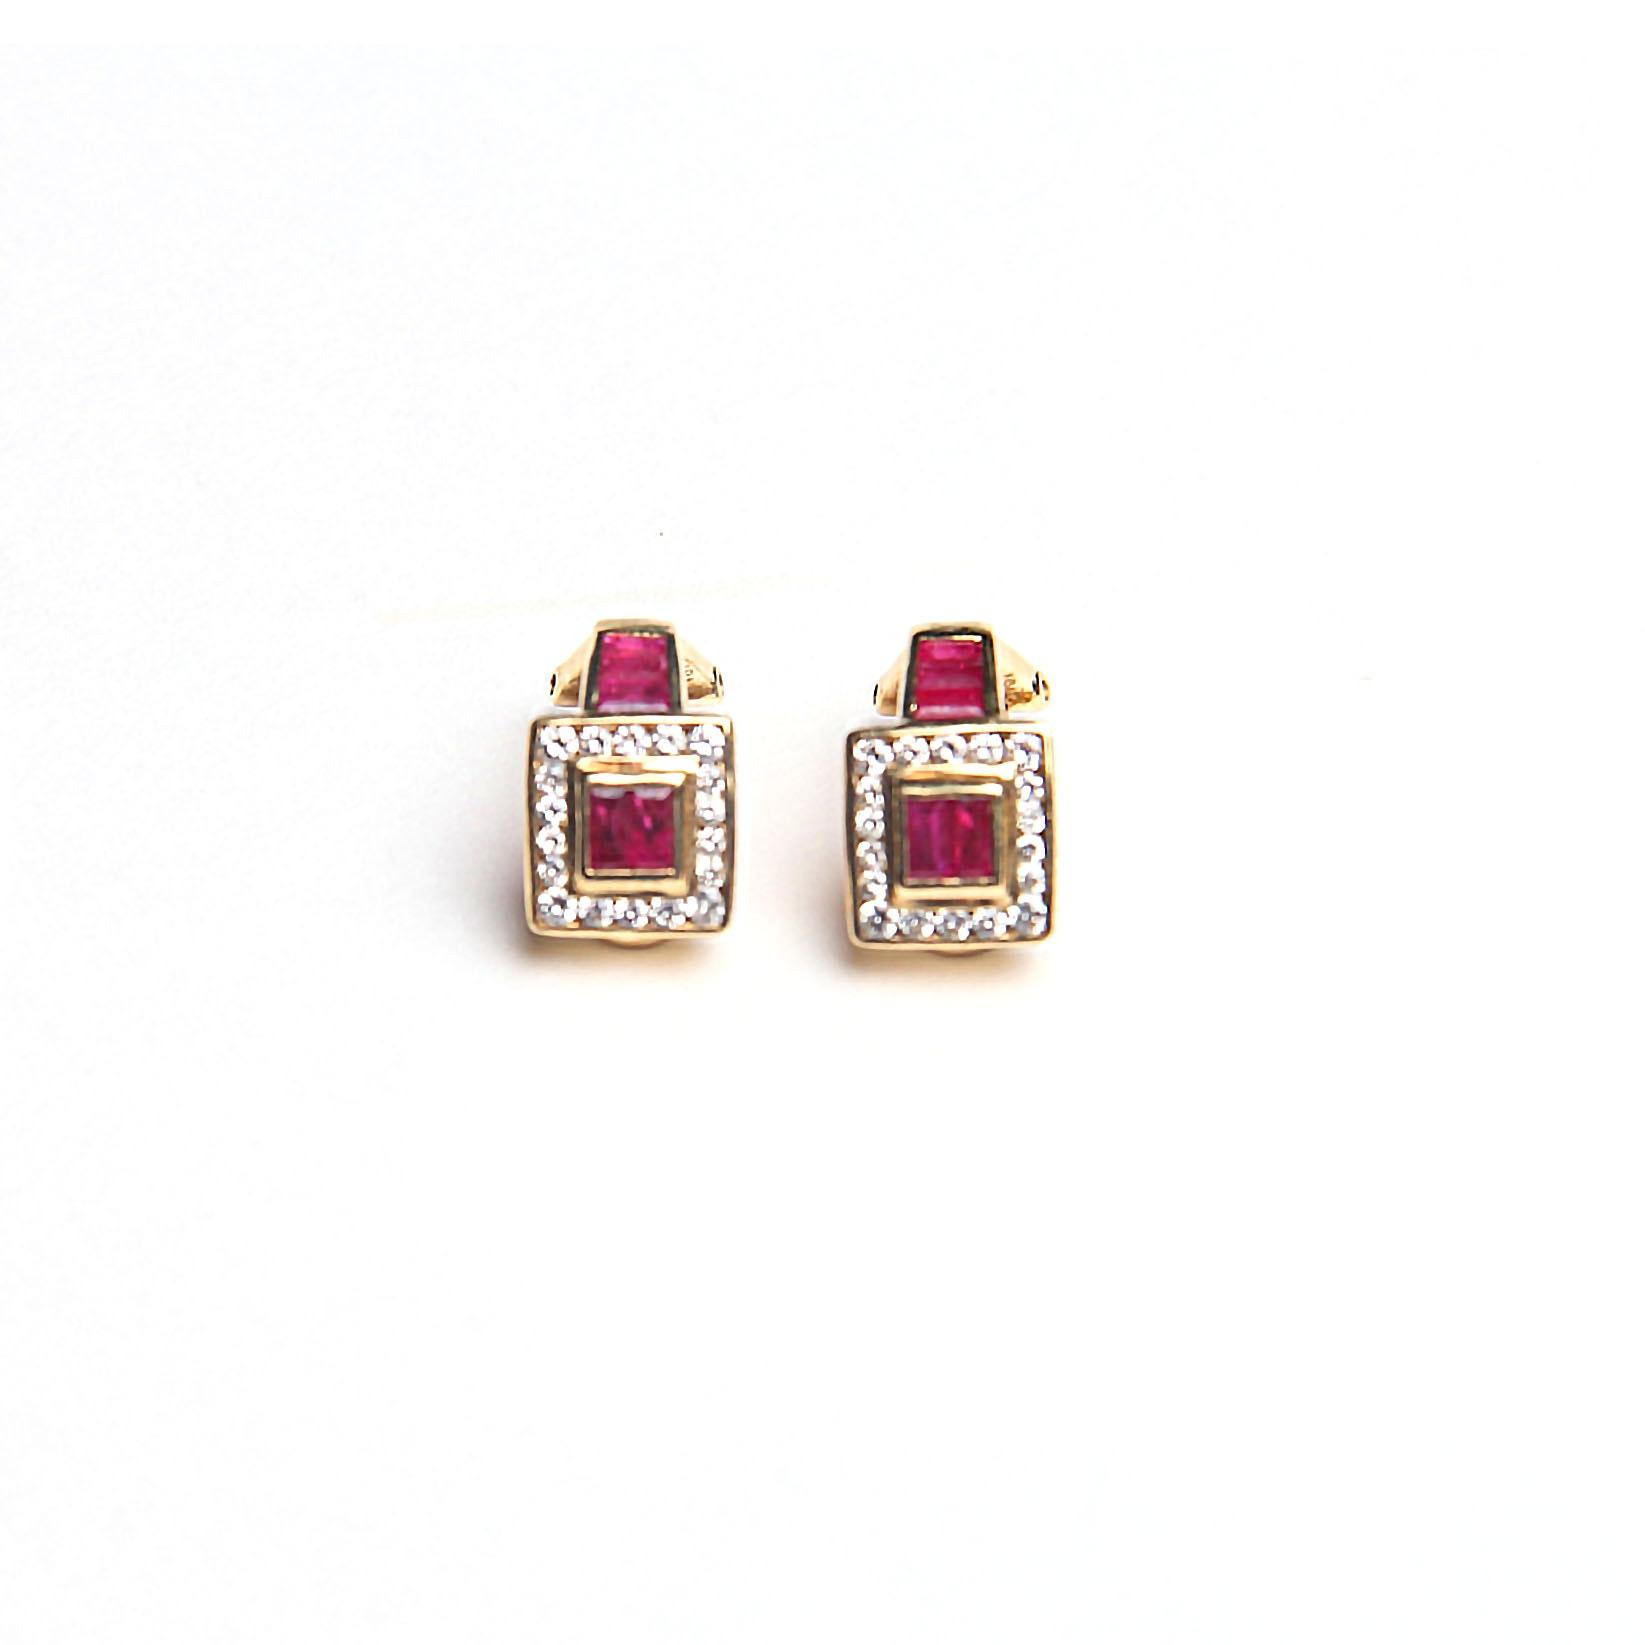 18K Diamond and Ruby Earrings